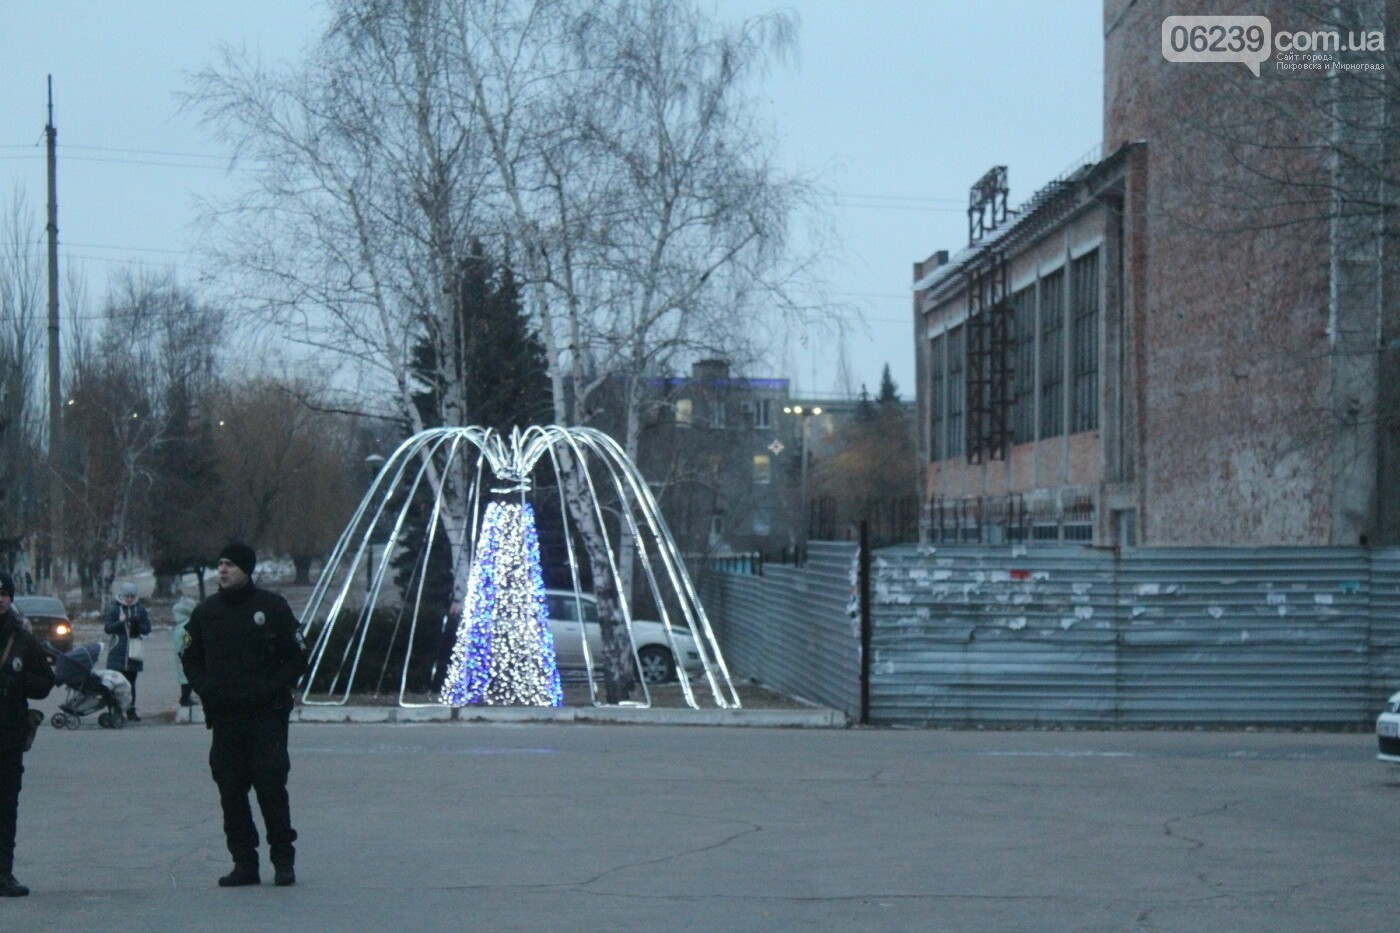 Центр Мирнограда засиял новогодними огнями , фото-3